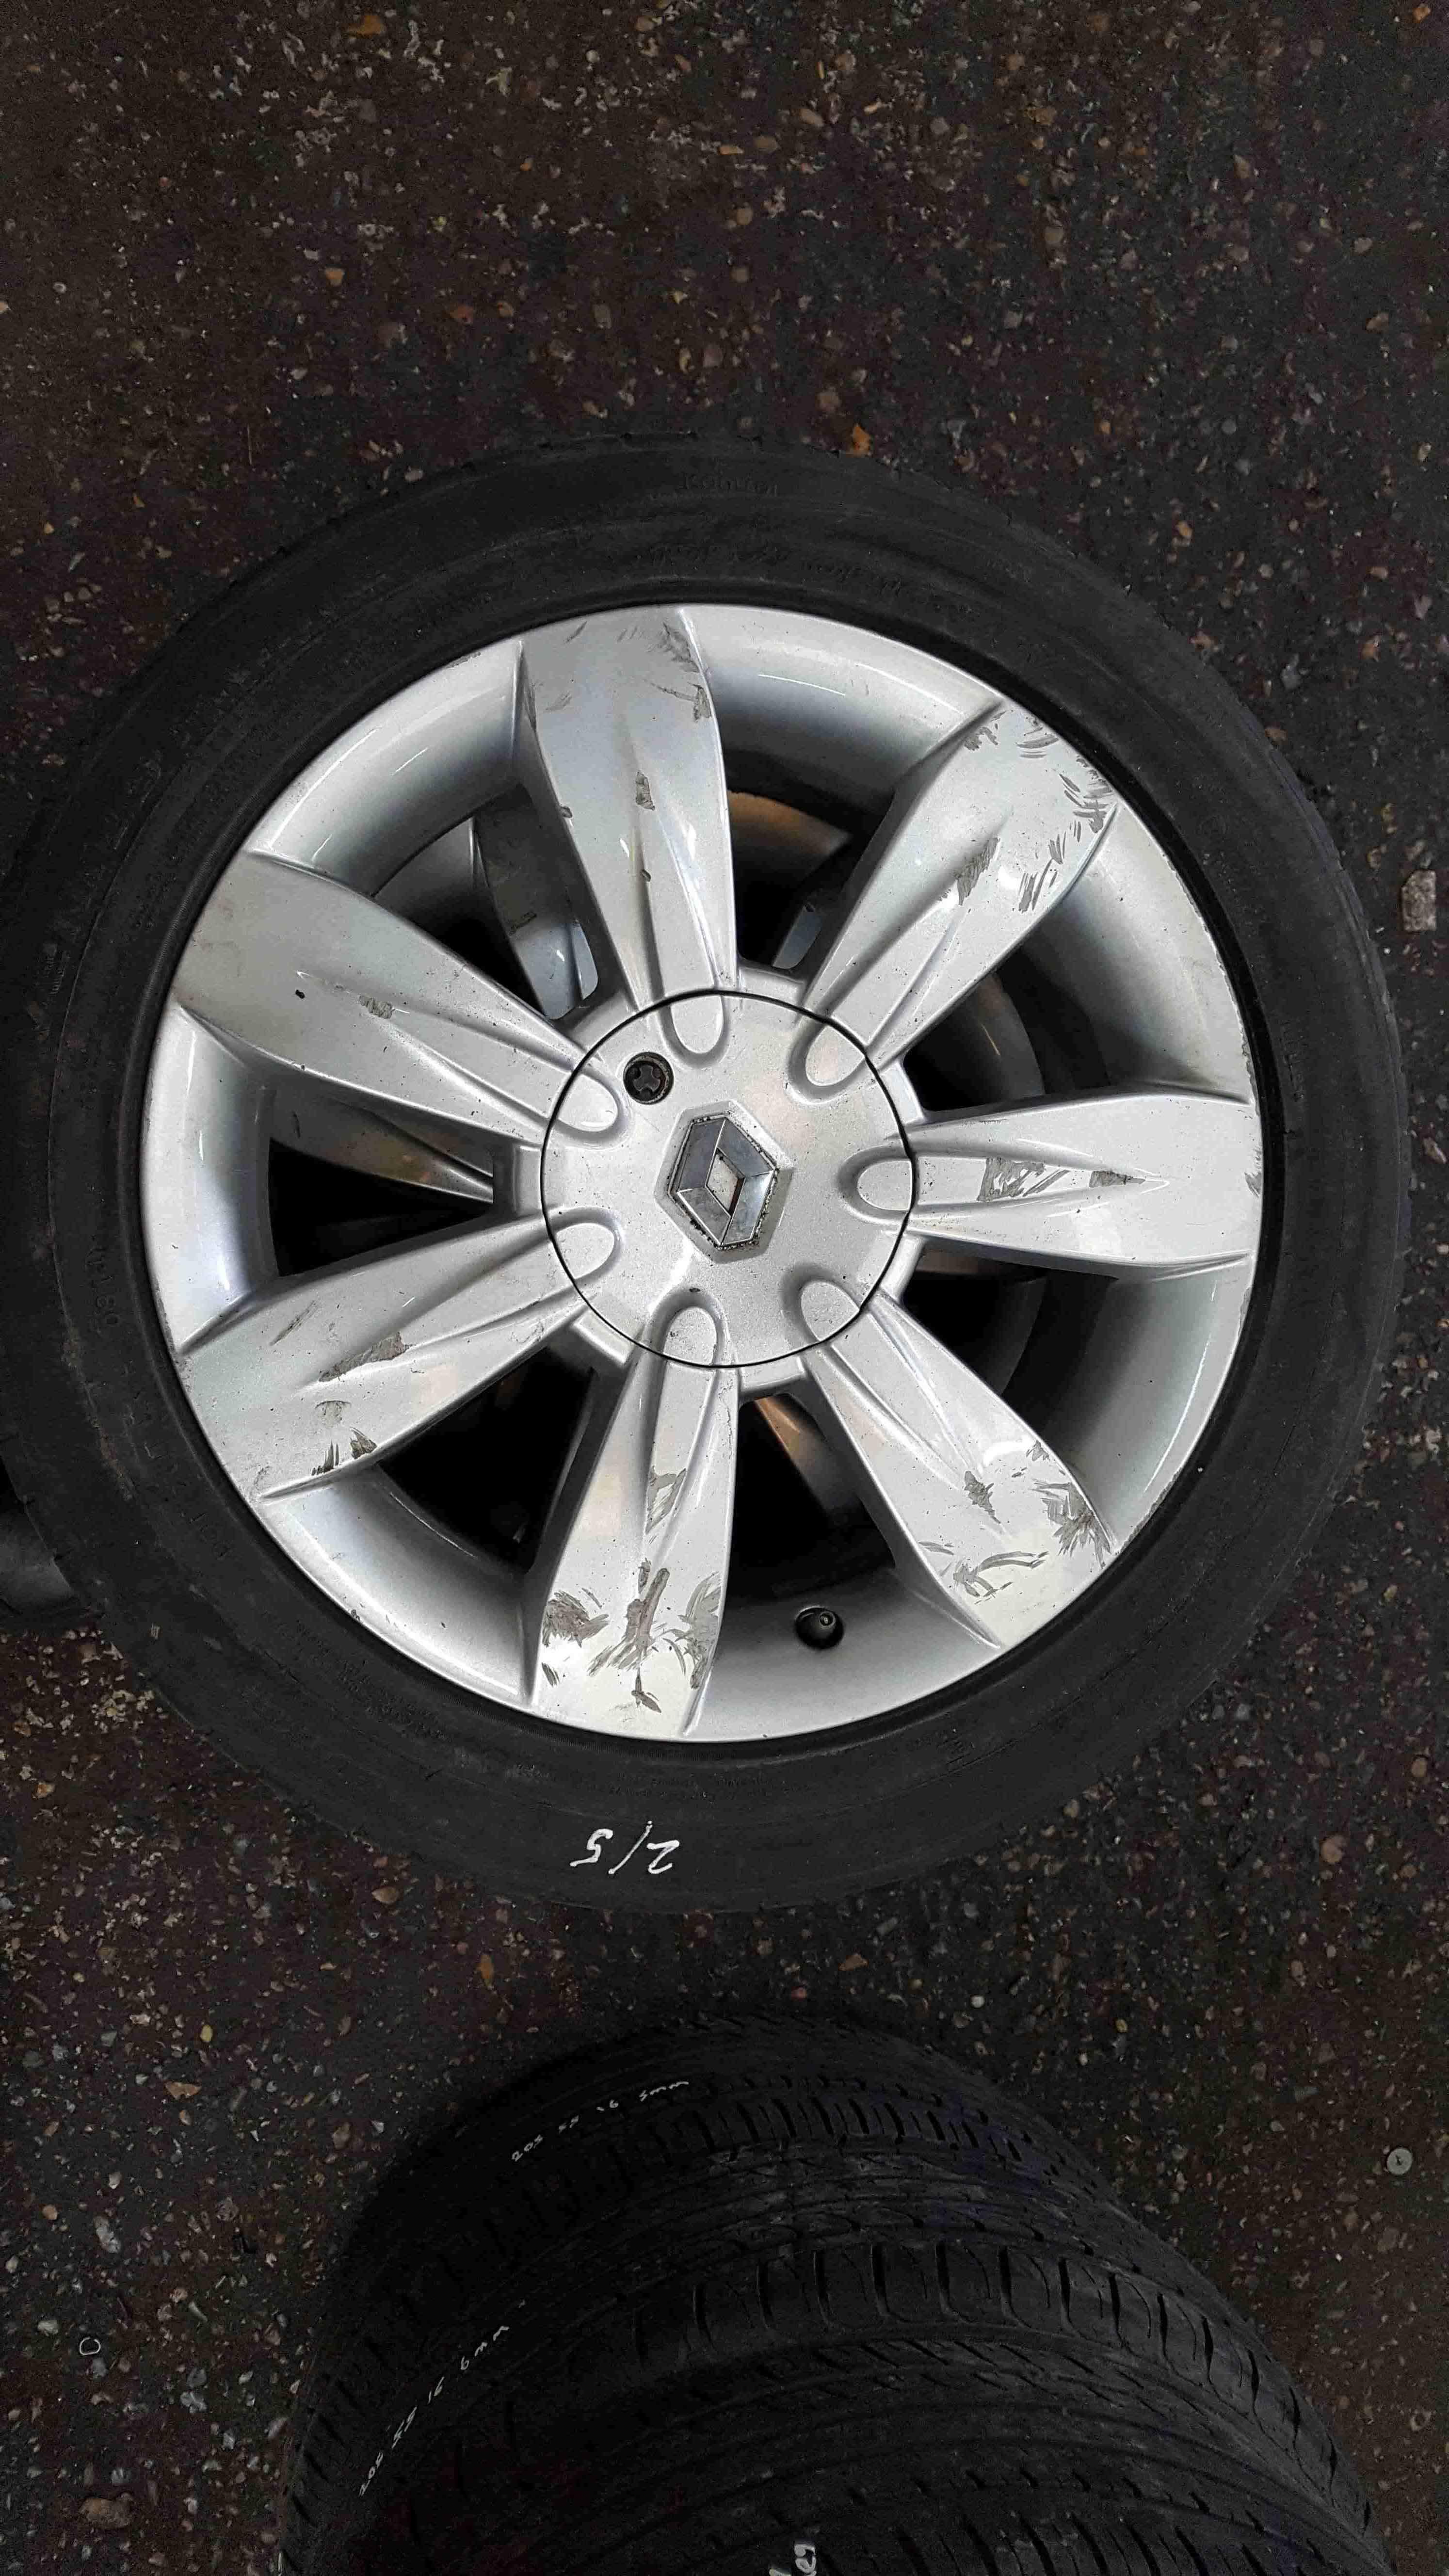 Renault Clio MK3 2005-2012 Lyria Alloy Wheel 16inch 8200400279